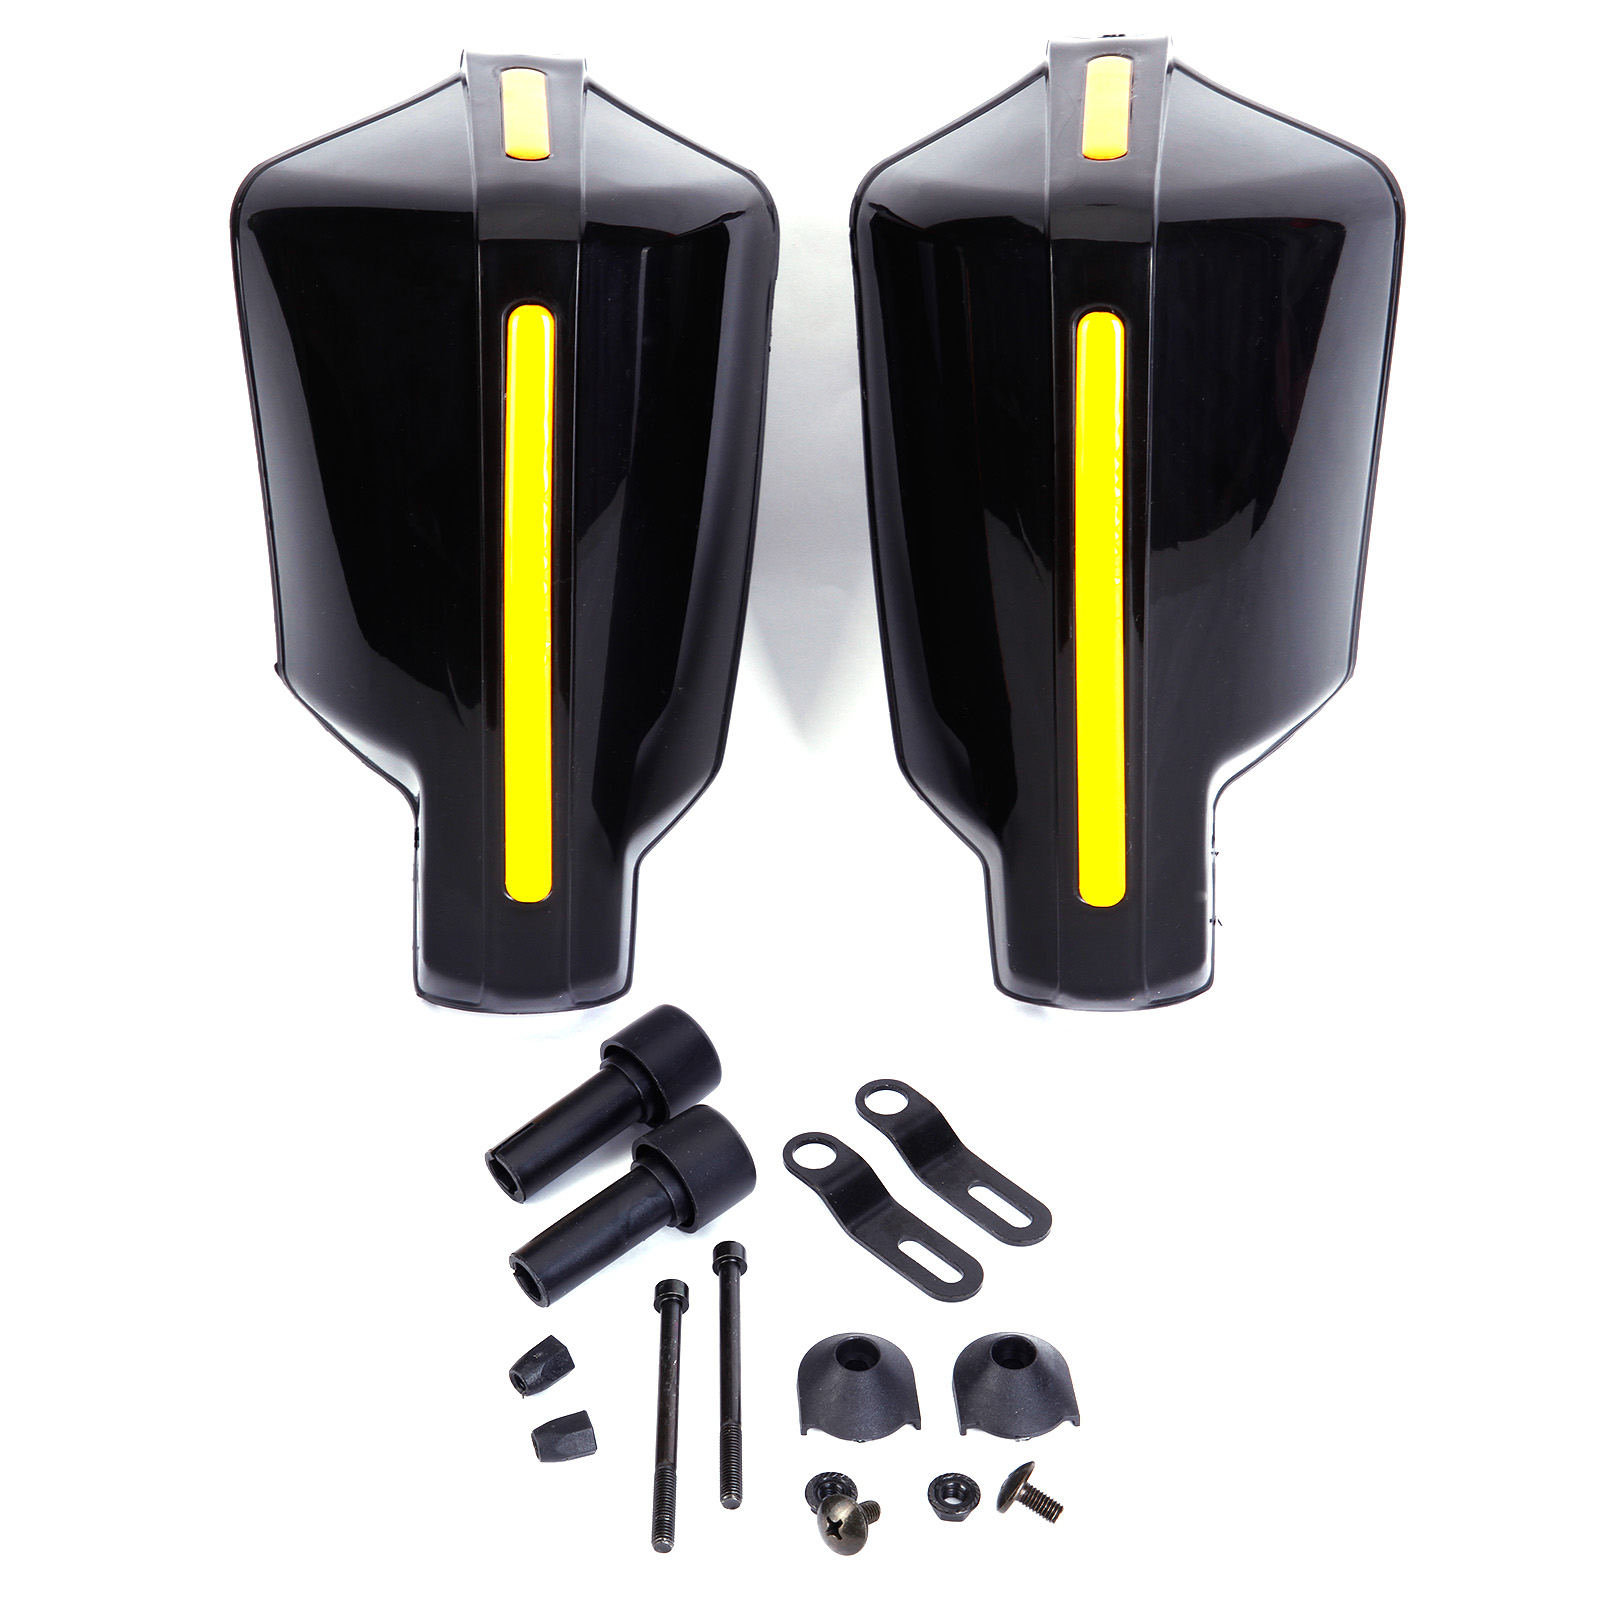 prot ge main noir jaune fixation guidon moto quad cross endur universel ebay. Black Bedroom Furniture Sets. Home Design Ideas